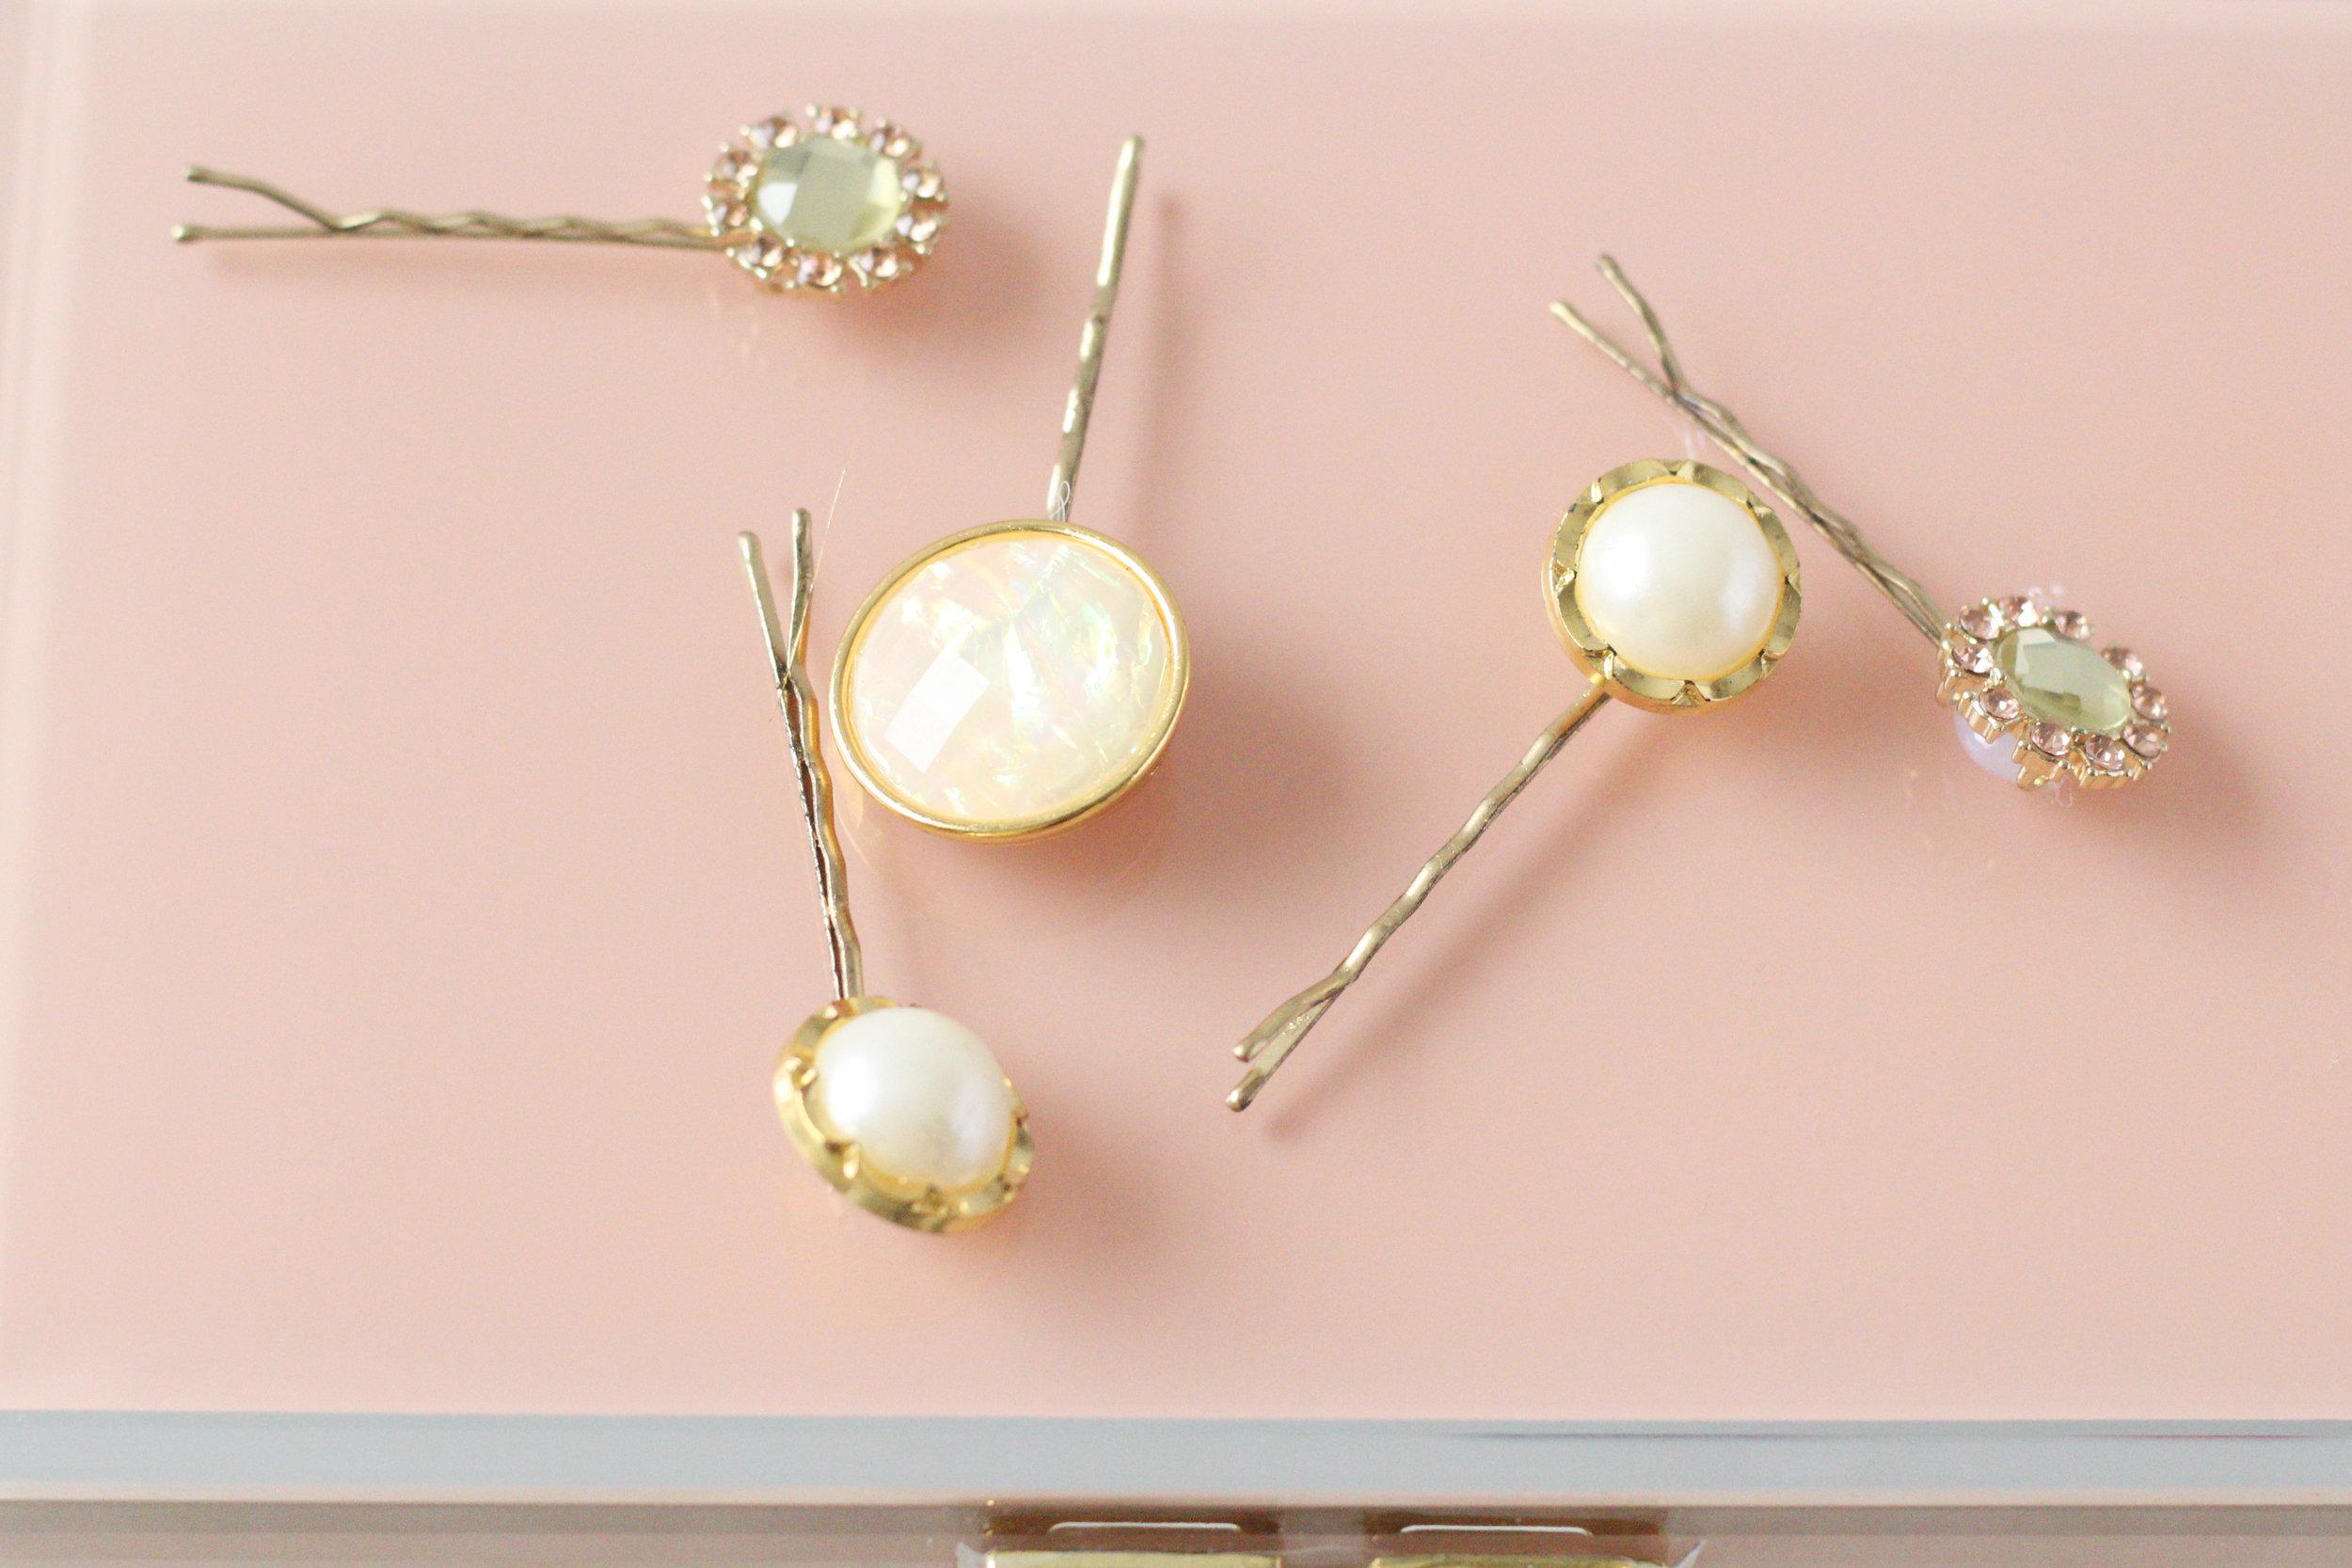 DIY-Anthropologie-bobby pins